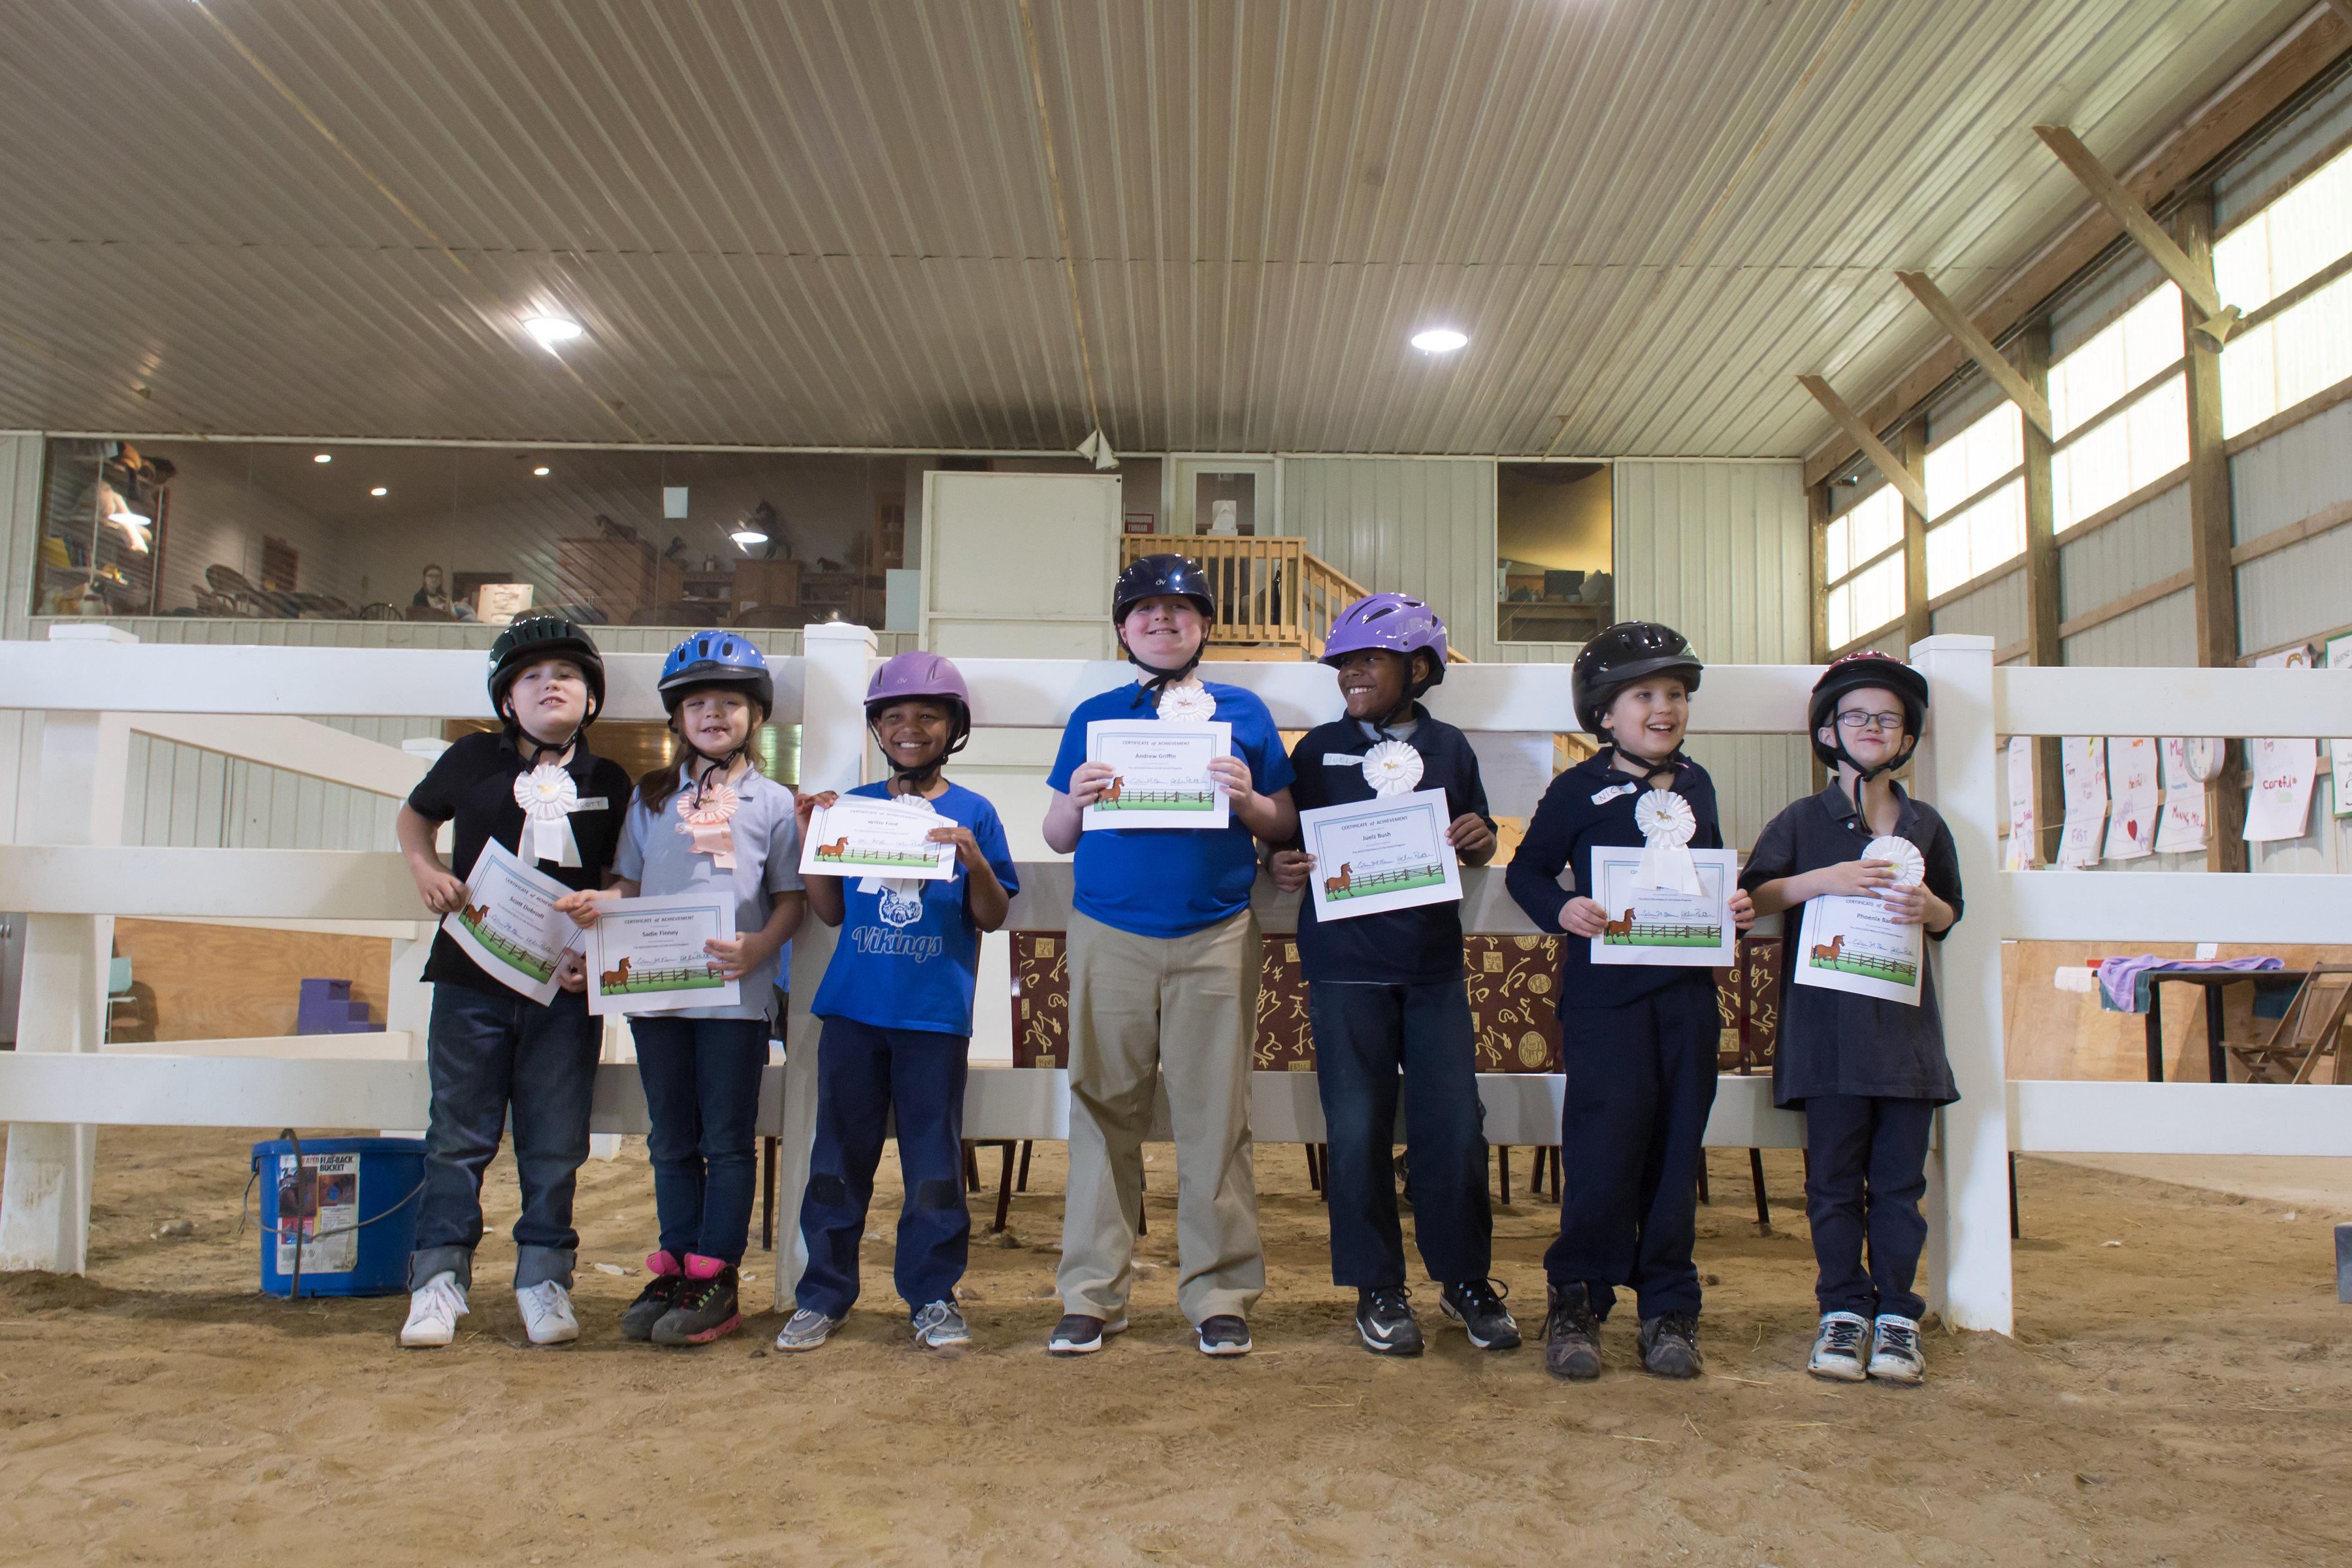 Michigan City School Program